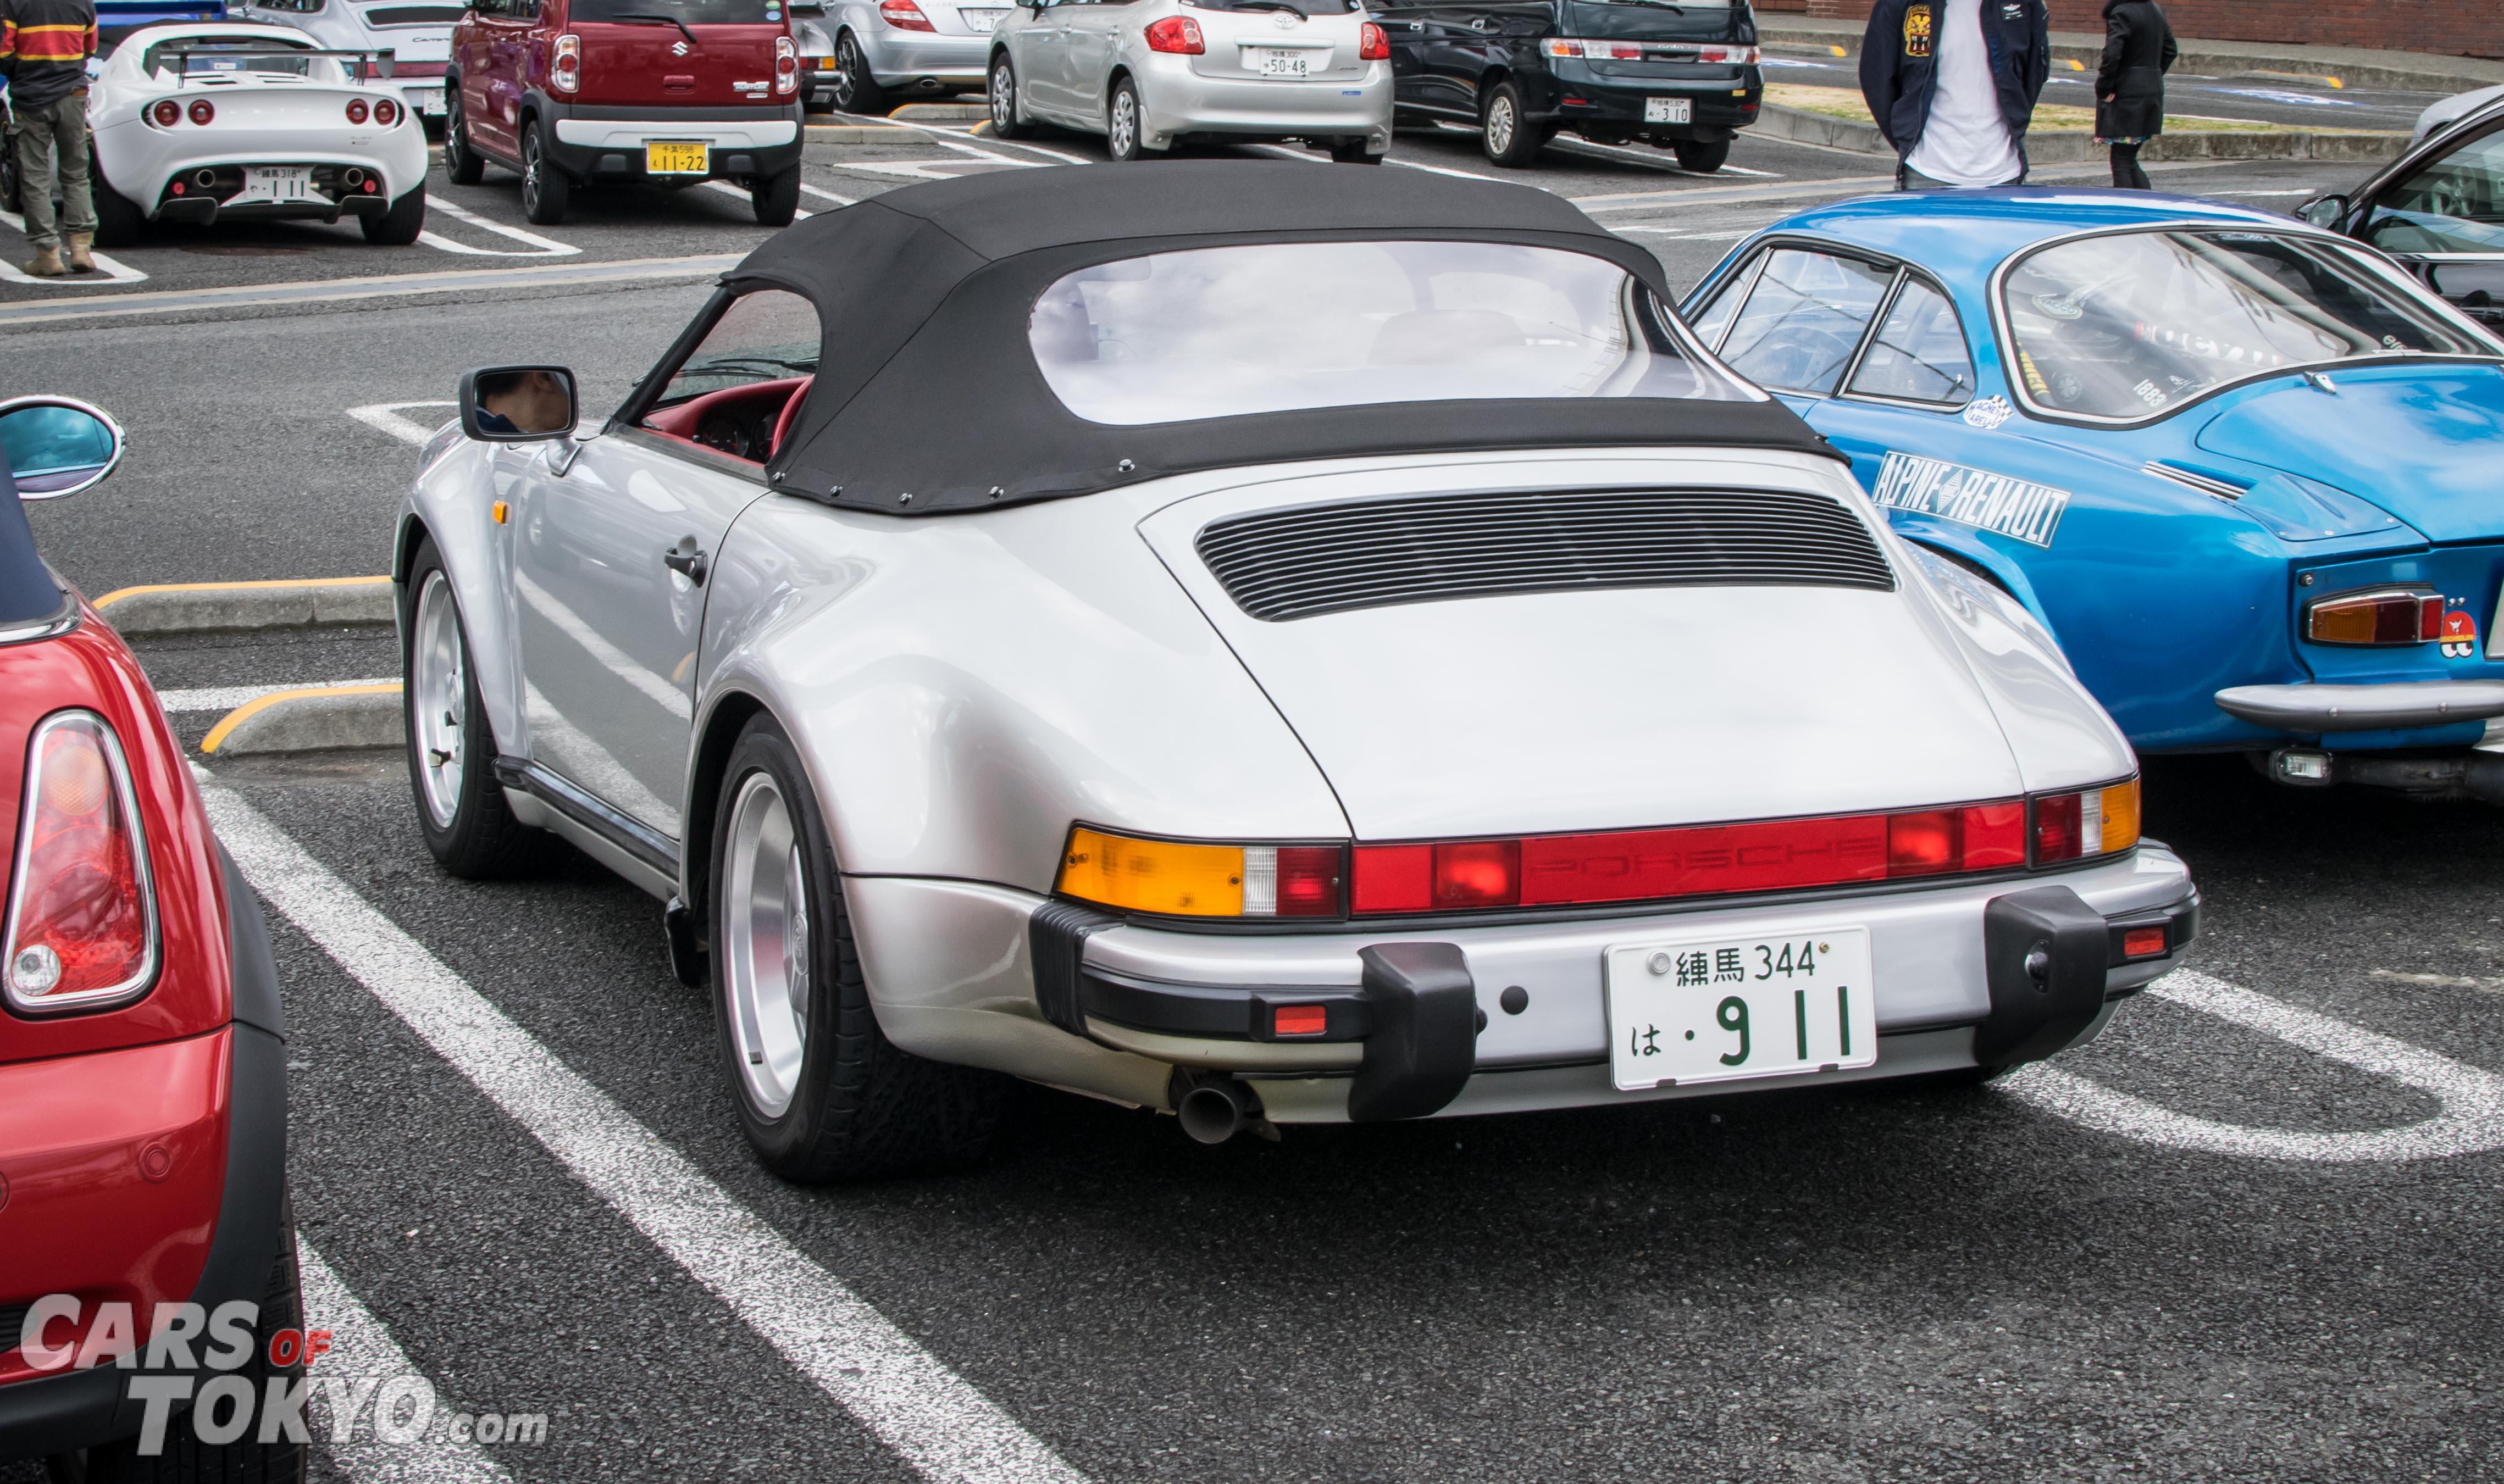 Cars of Tokyo Porsche 911 Speedster